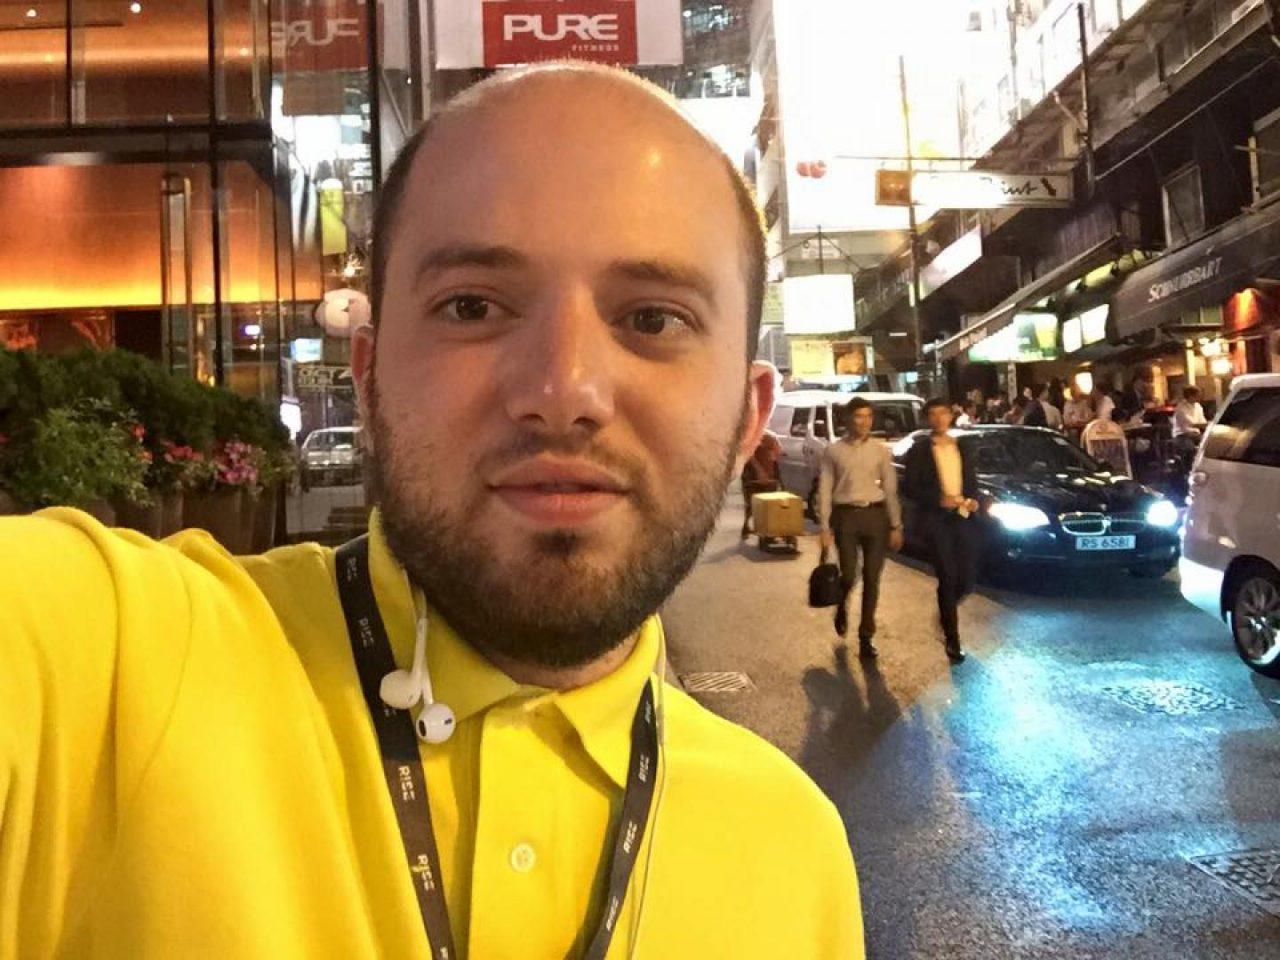 Ucraft-ի հիմնադիր Գևորգ Բալյանը դարձել է Forbes Technology Council-ի անդամ